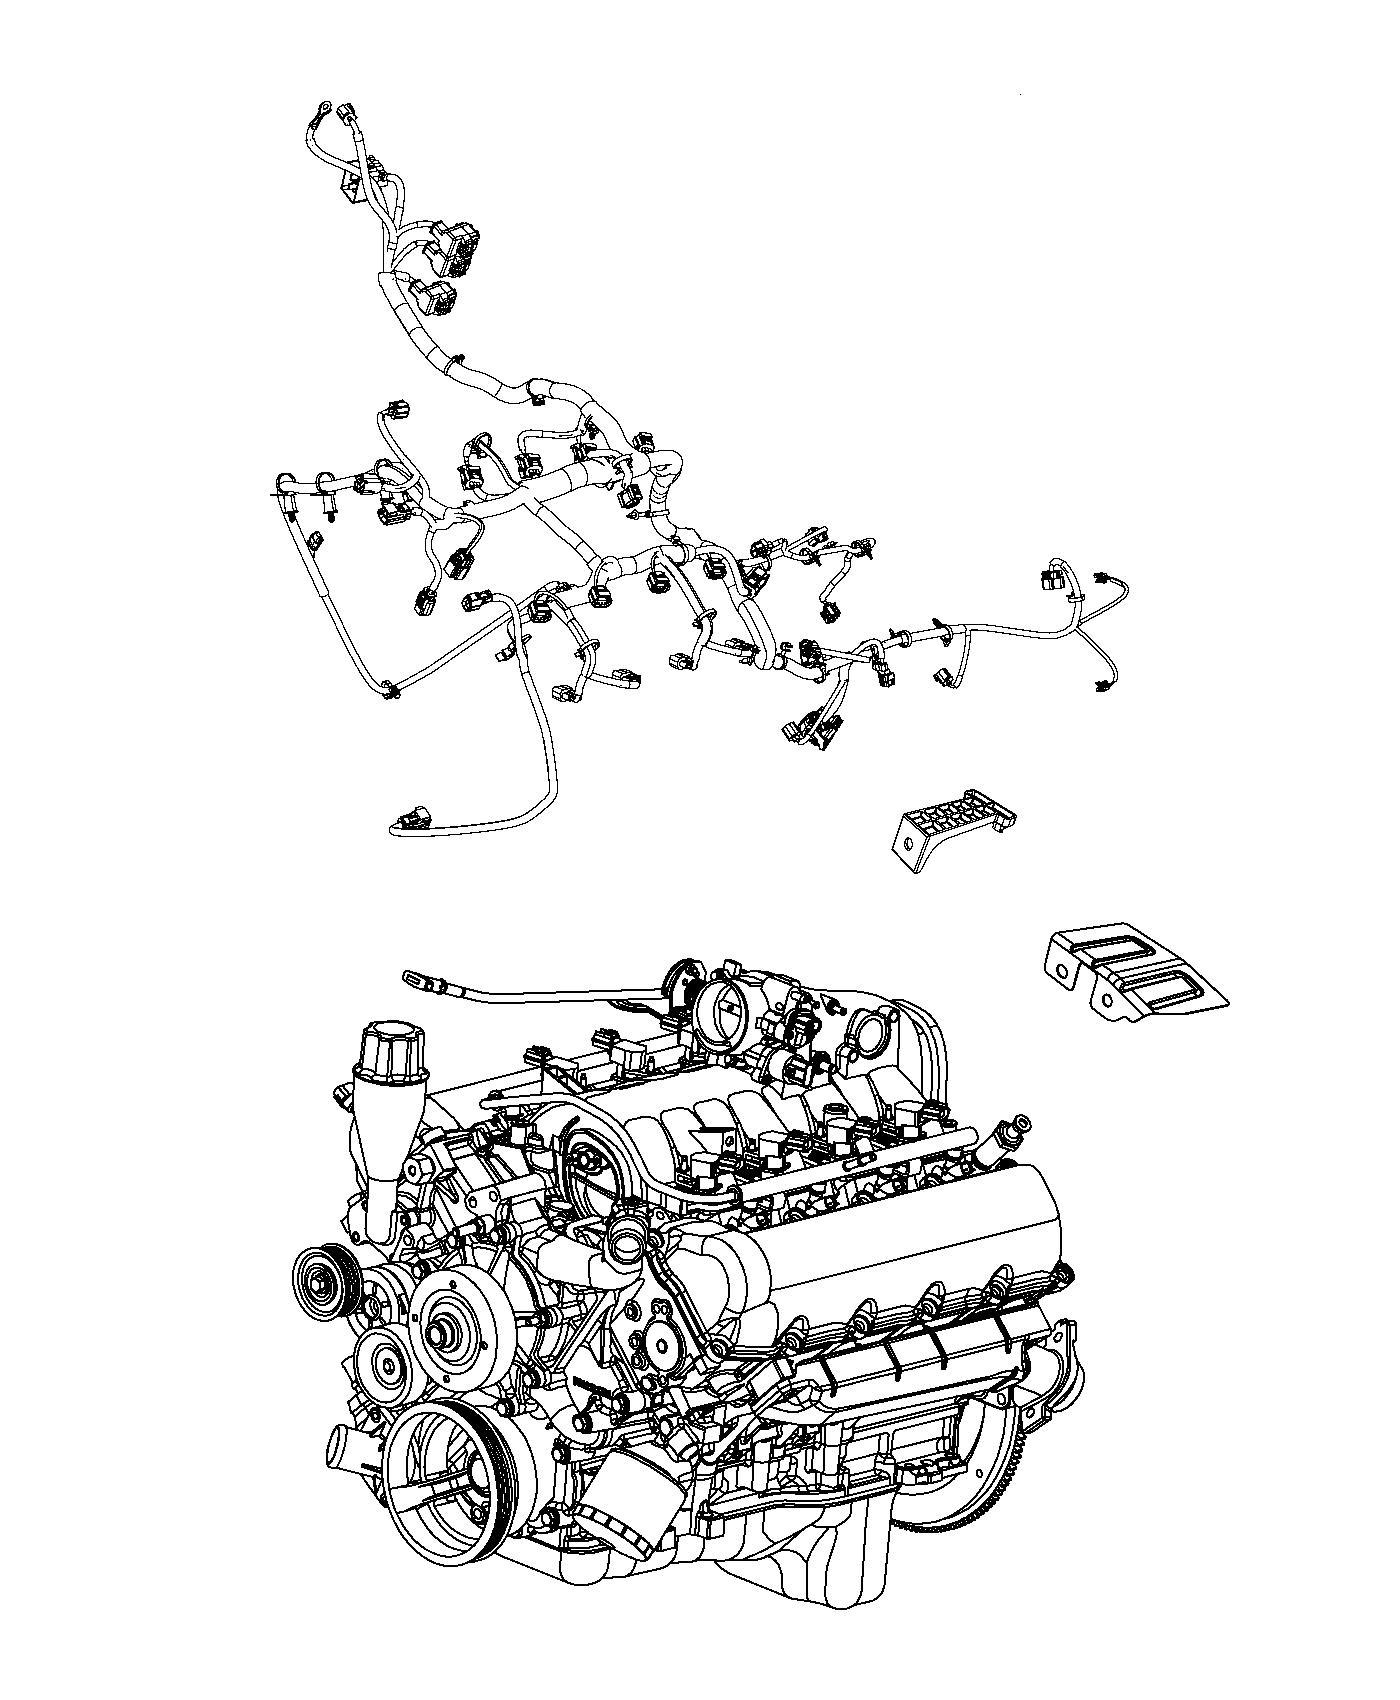 2011 Dodge Ram 3500 Bracket. Engine wiring. Ngc bracket